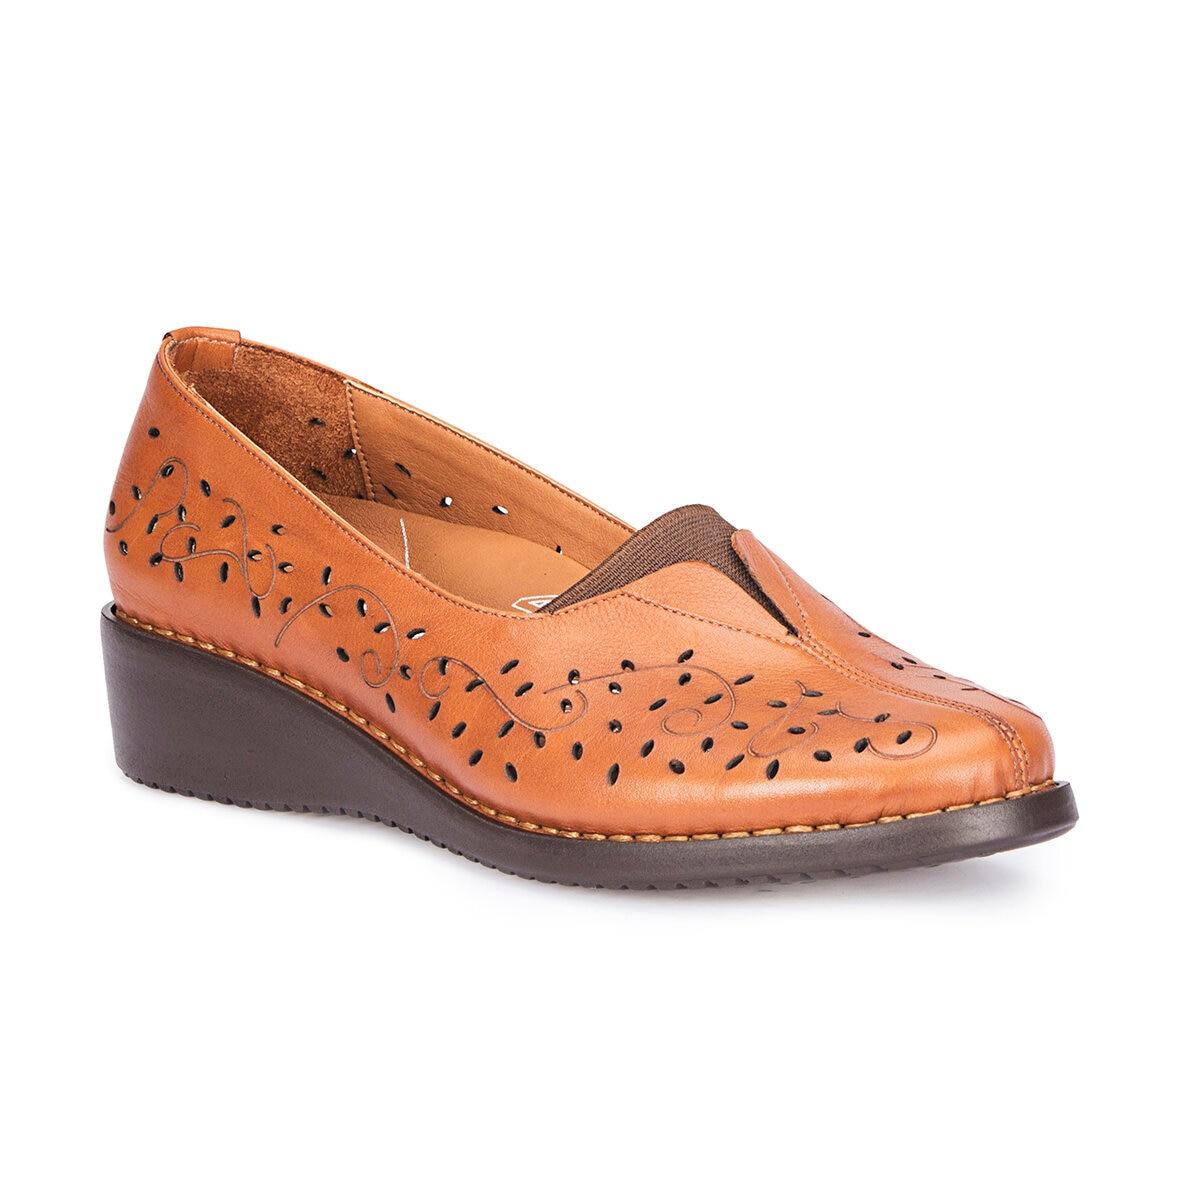 FLO 71.109651.Z Tan Women 'S Wedges Shoes Polaris 5 Point